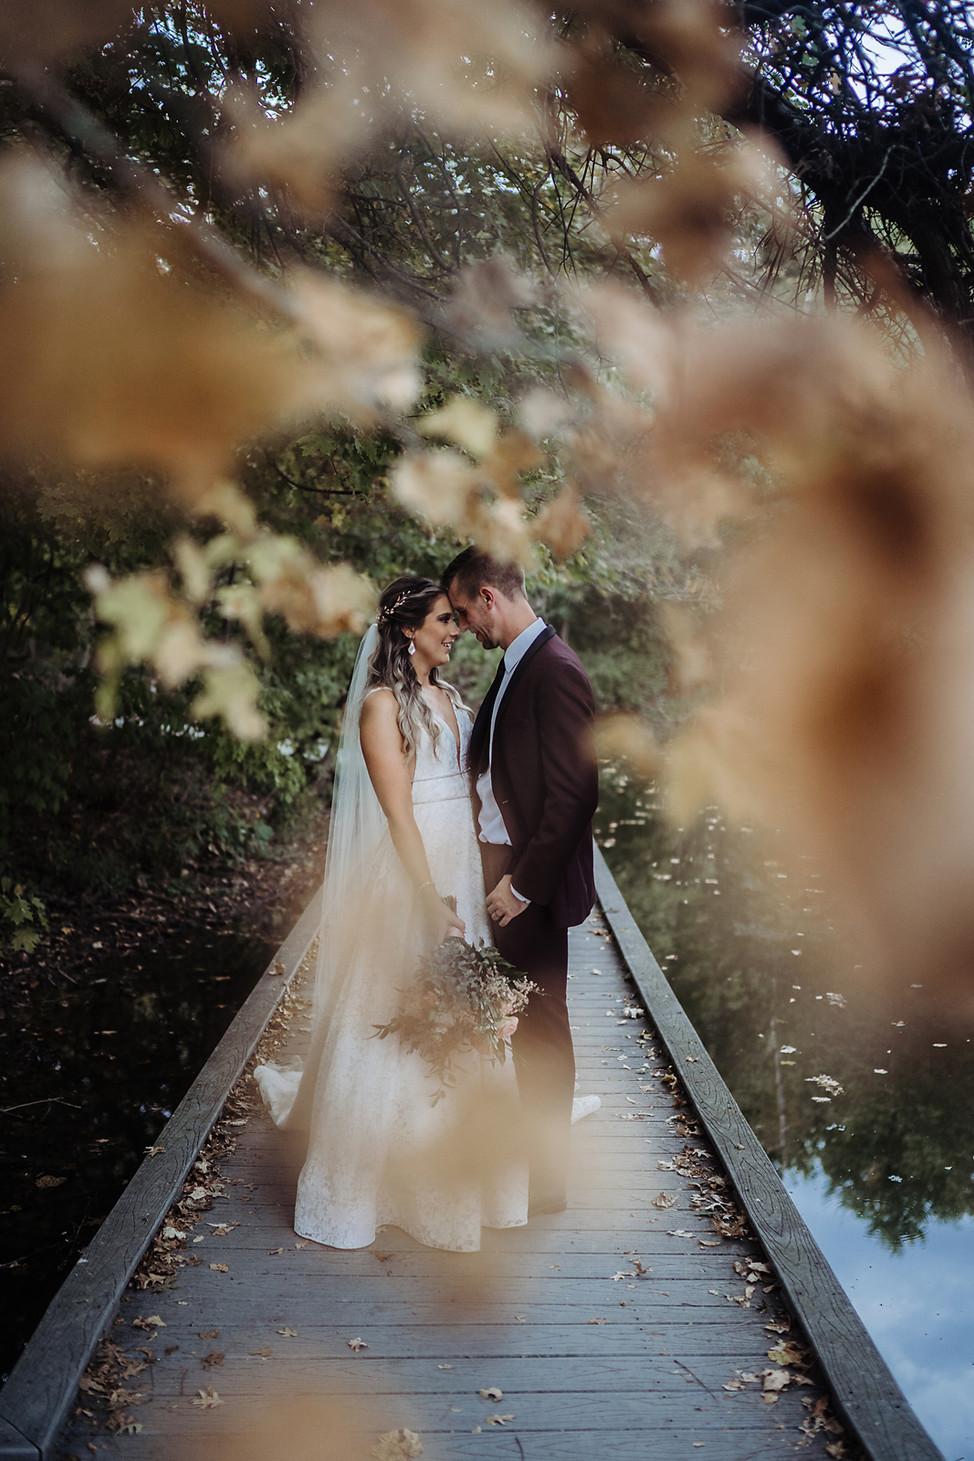 Payne + Abbey || Wedding, Krippendorf Lodge